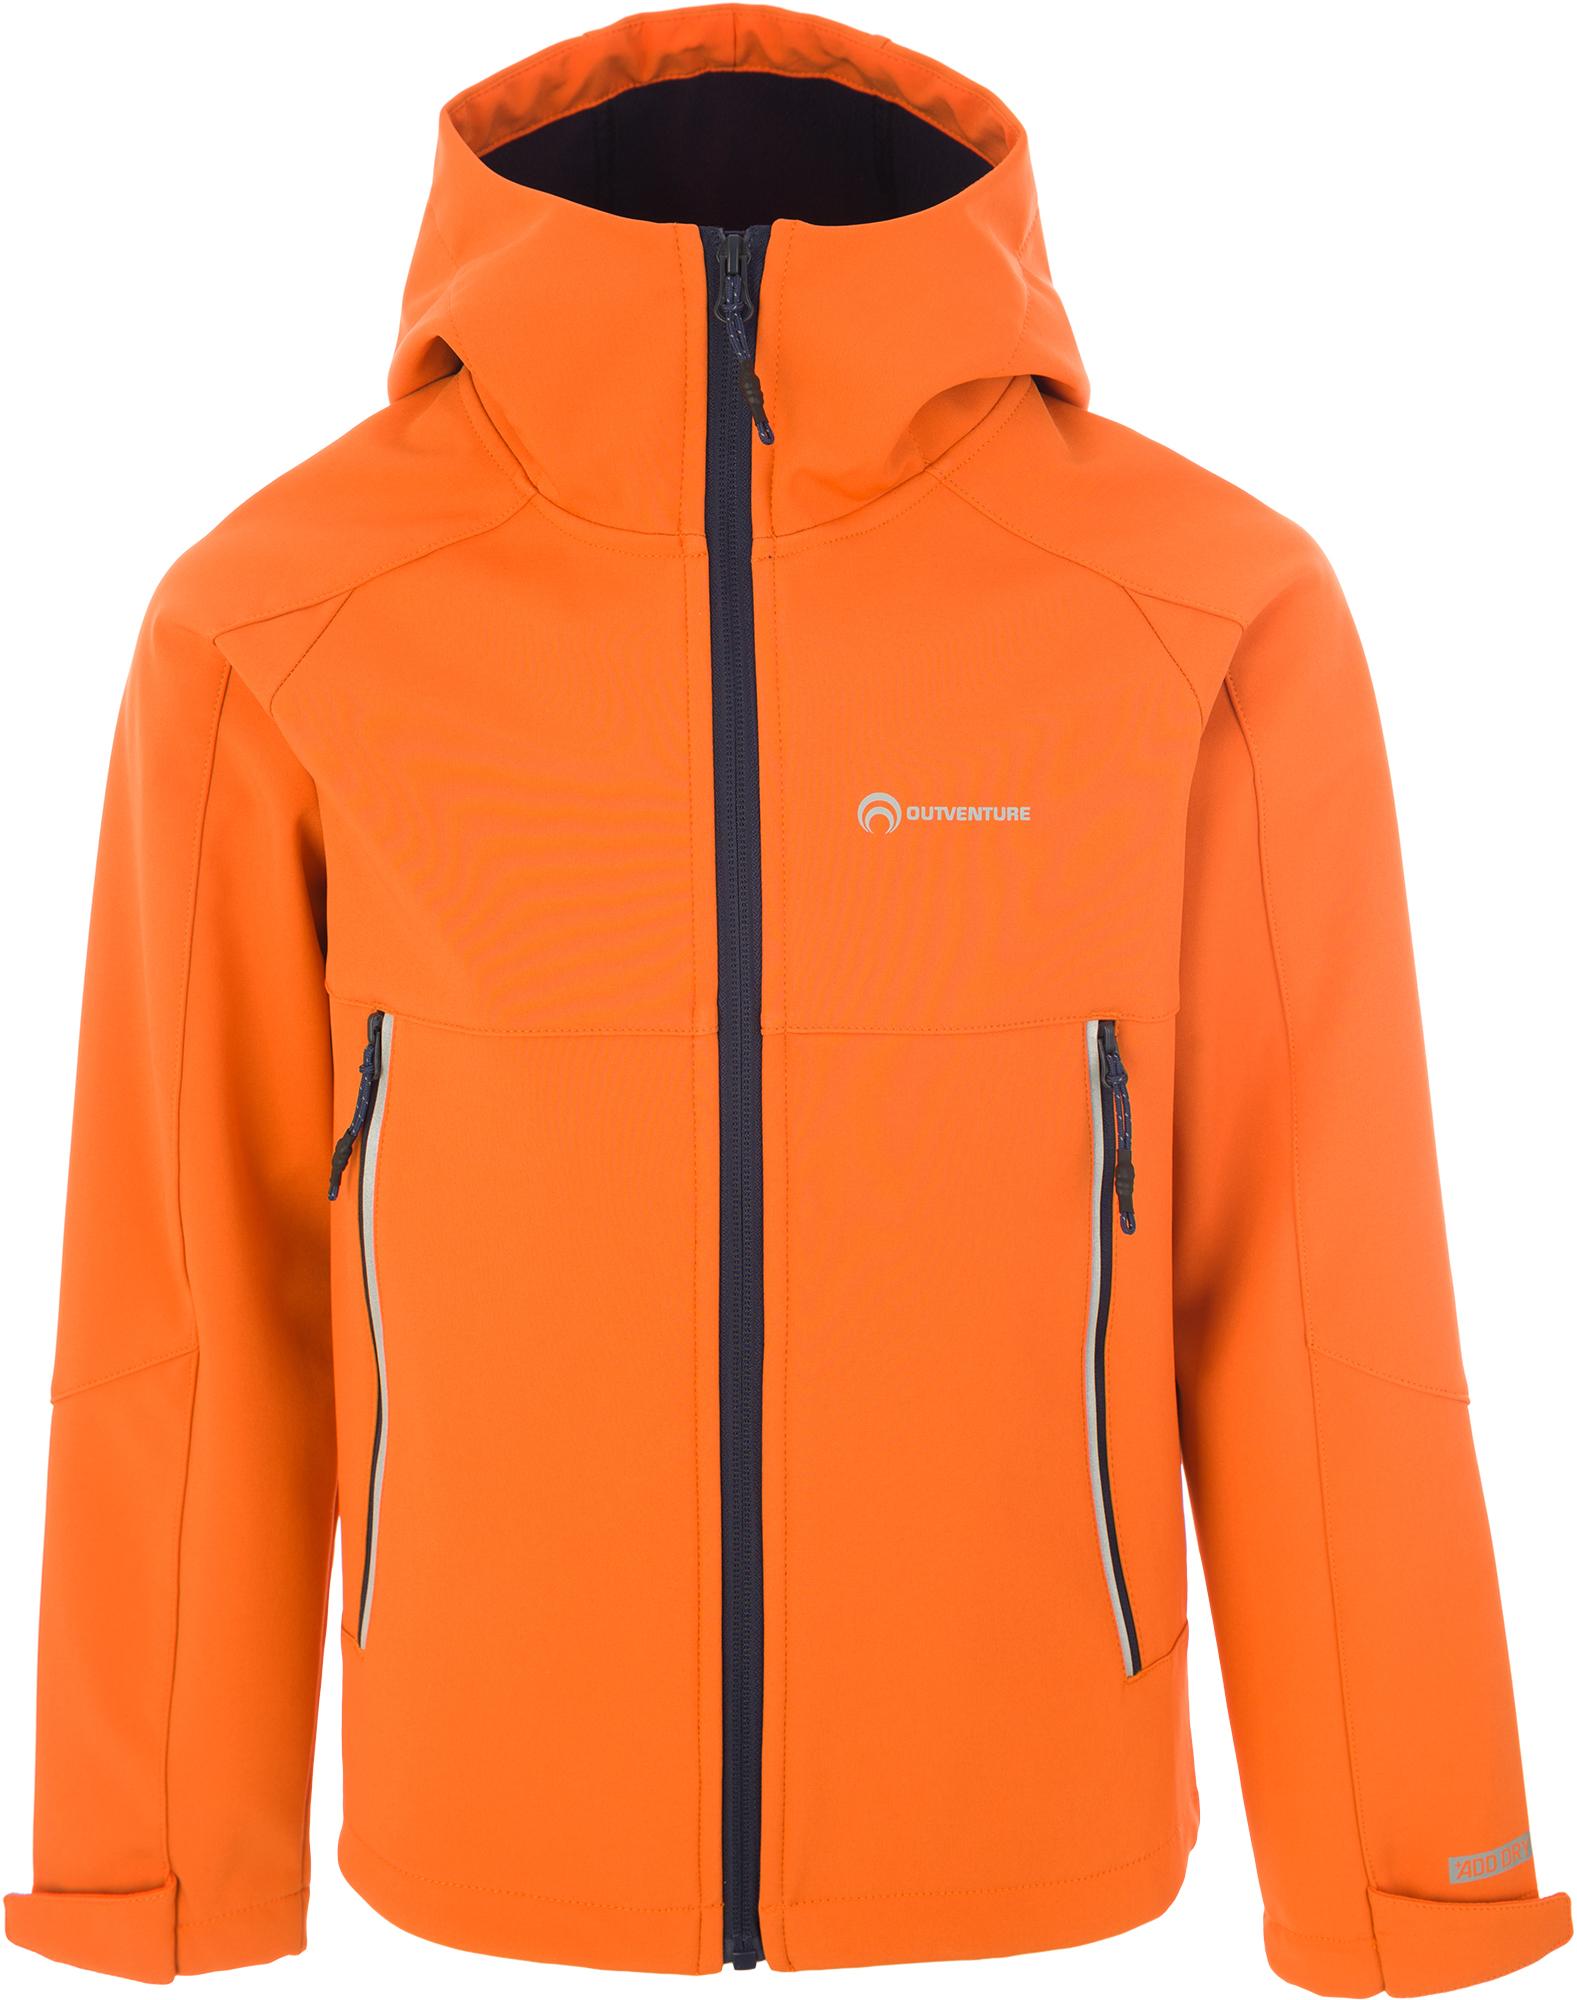 Outventure Куртка софт-шелл для мальчиков Outventure, размер 170